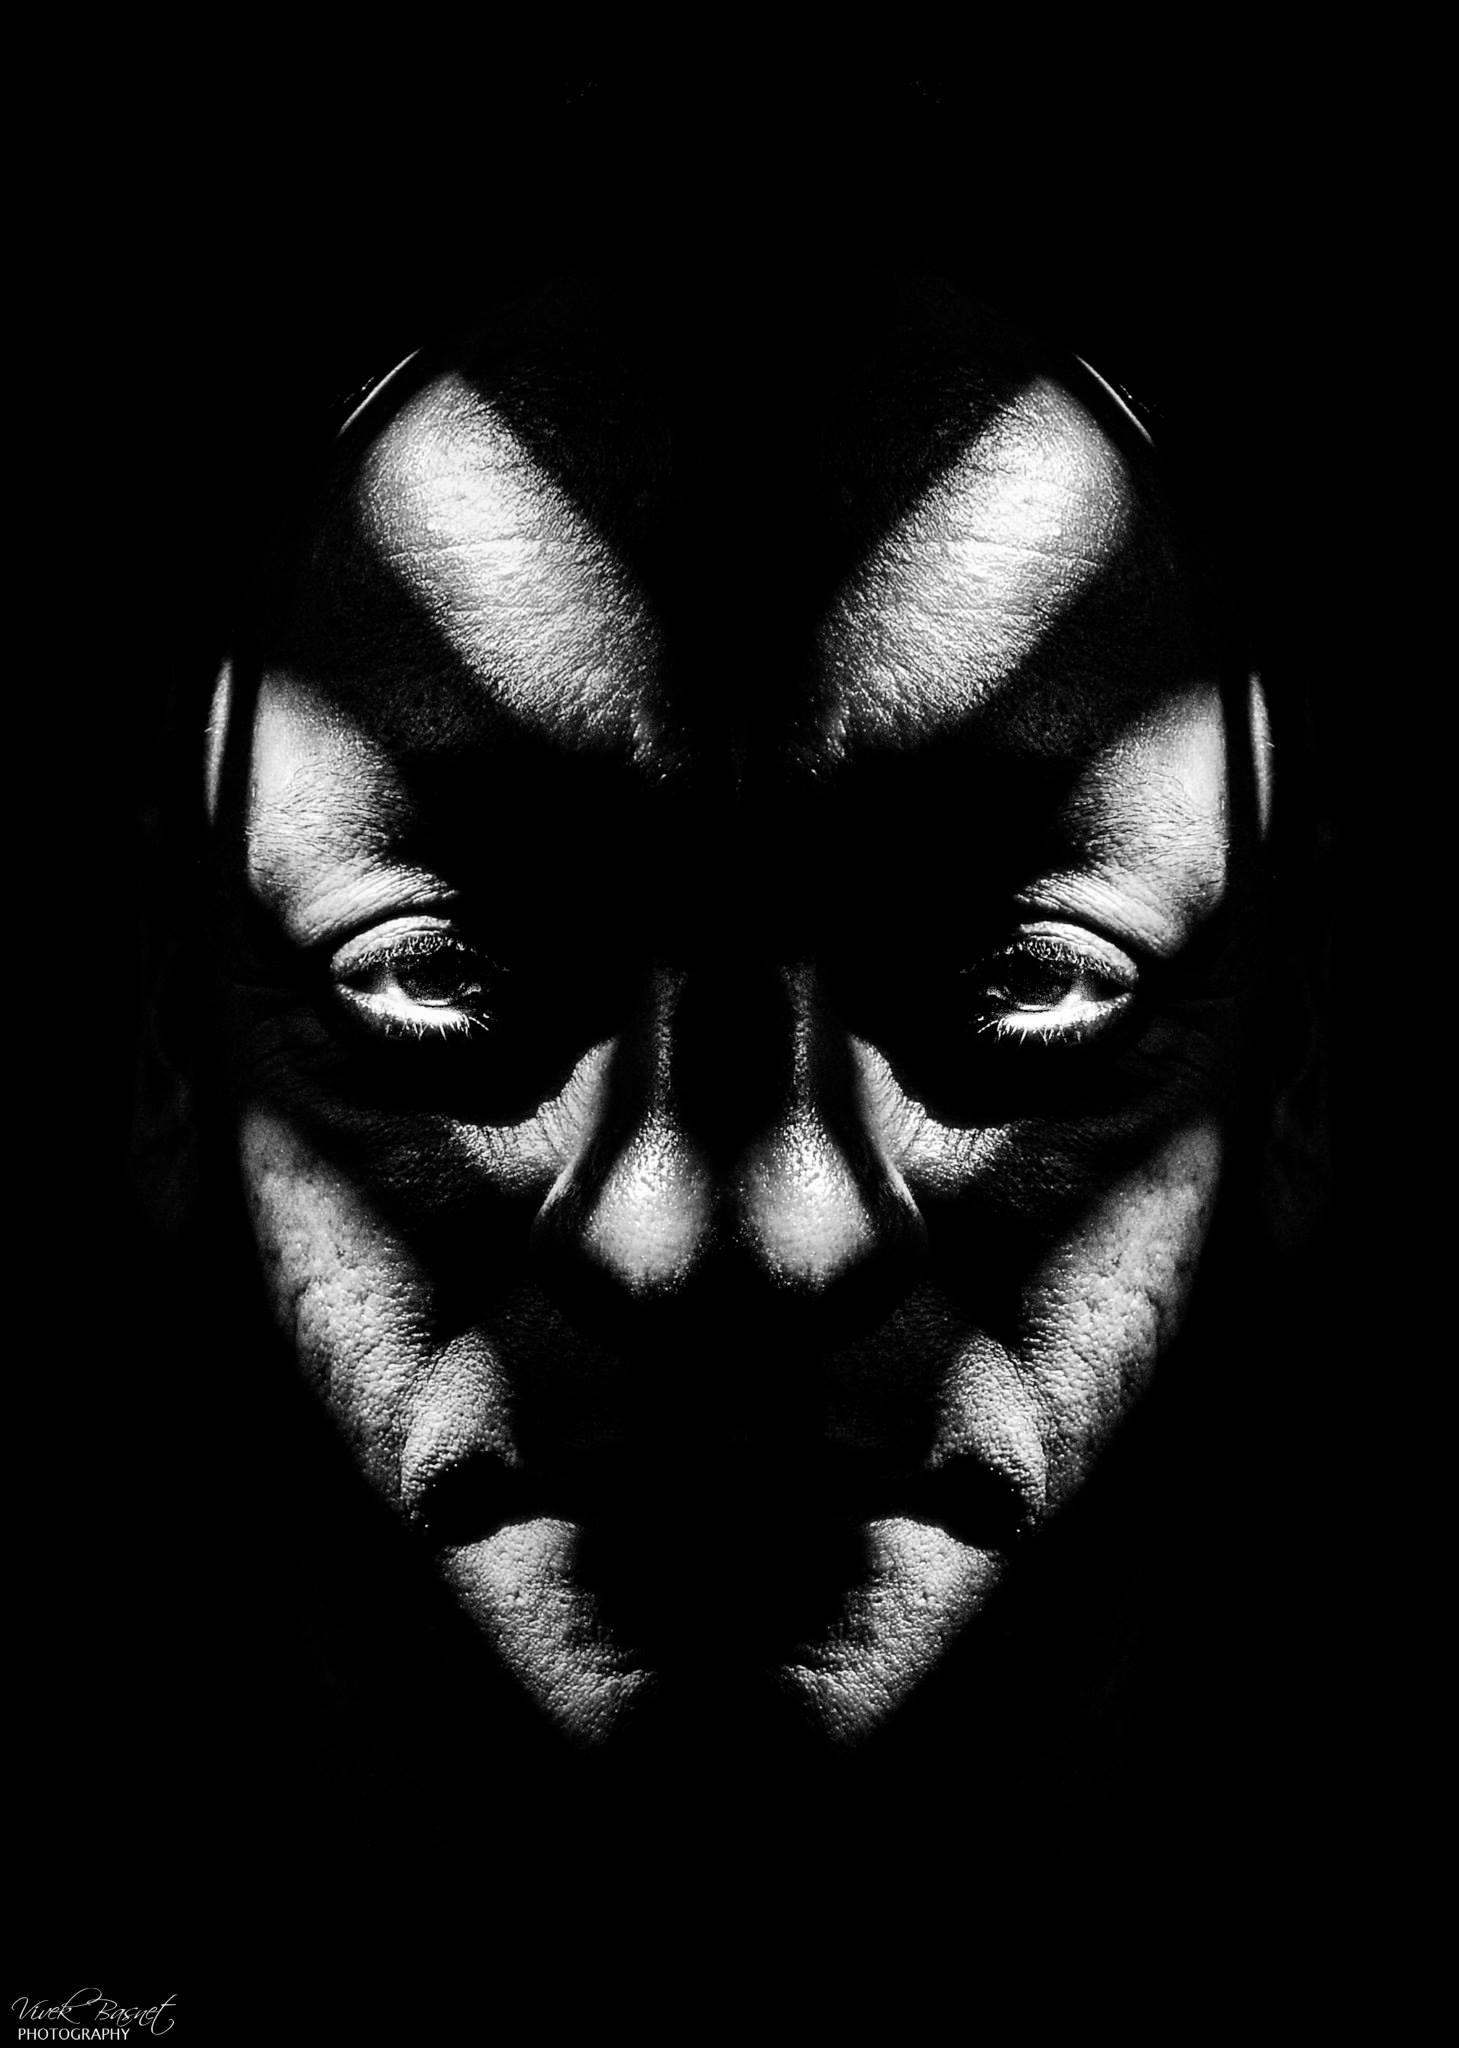 Mask on a man